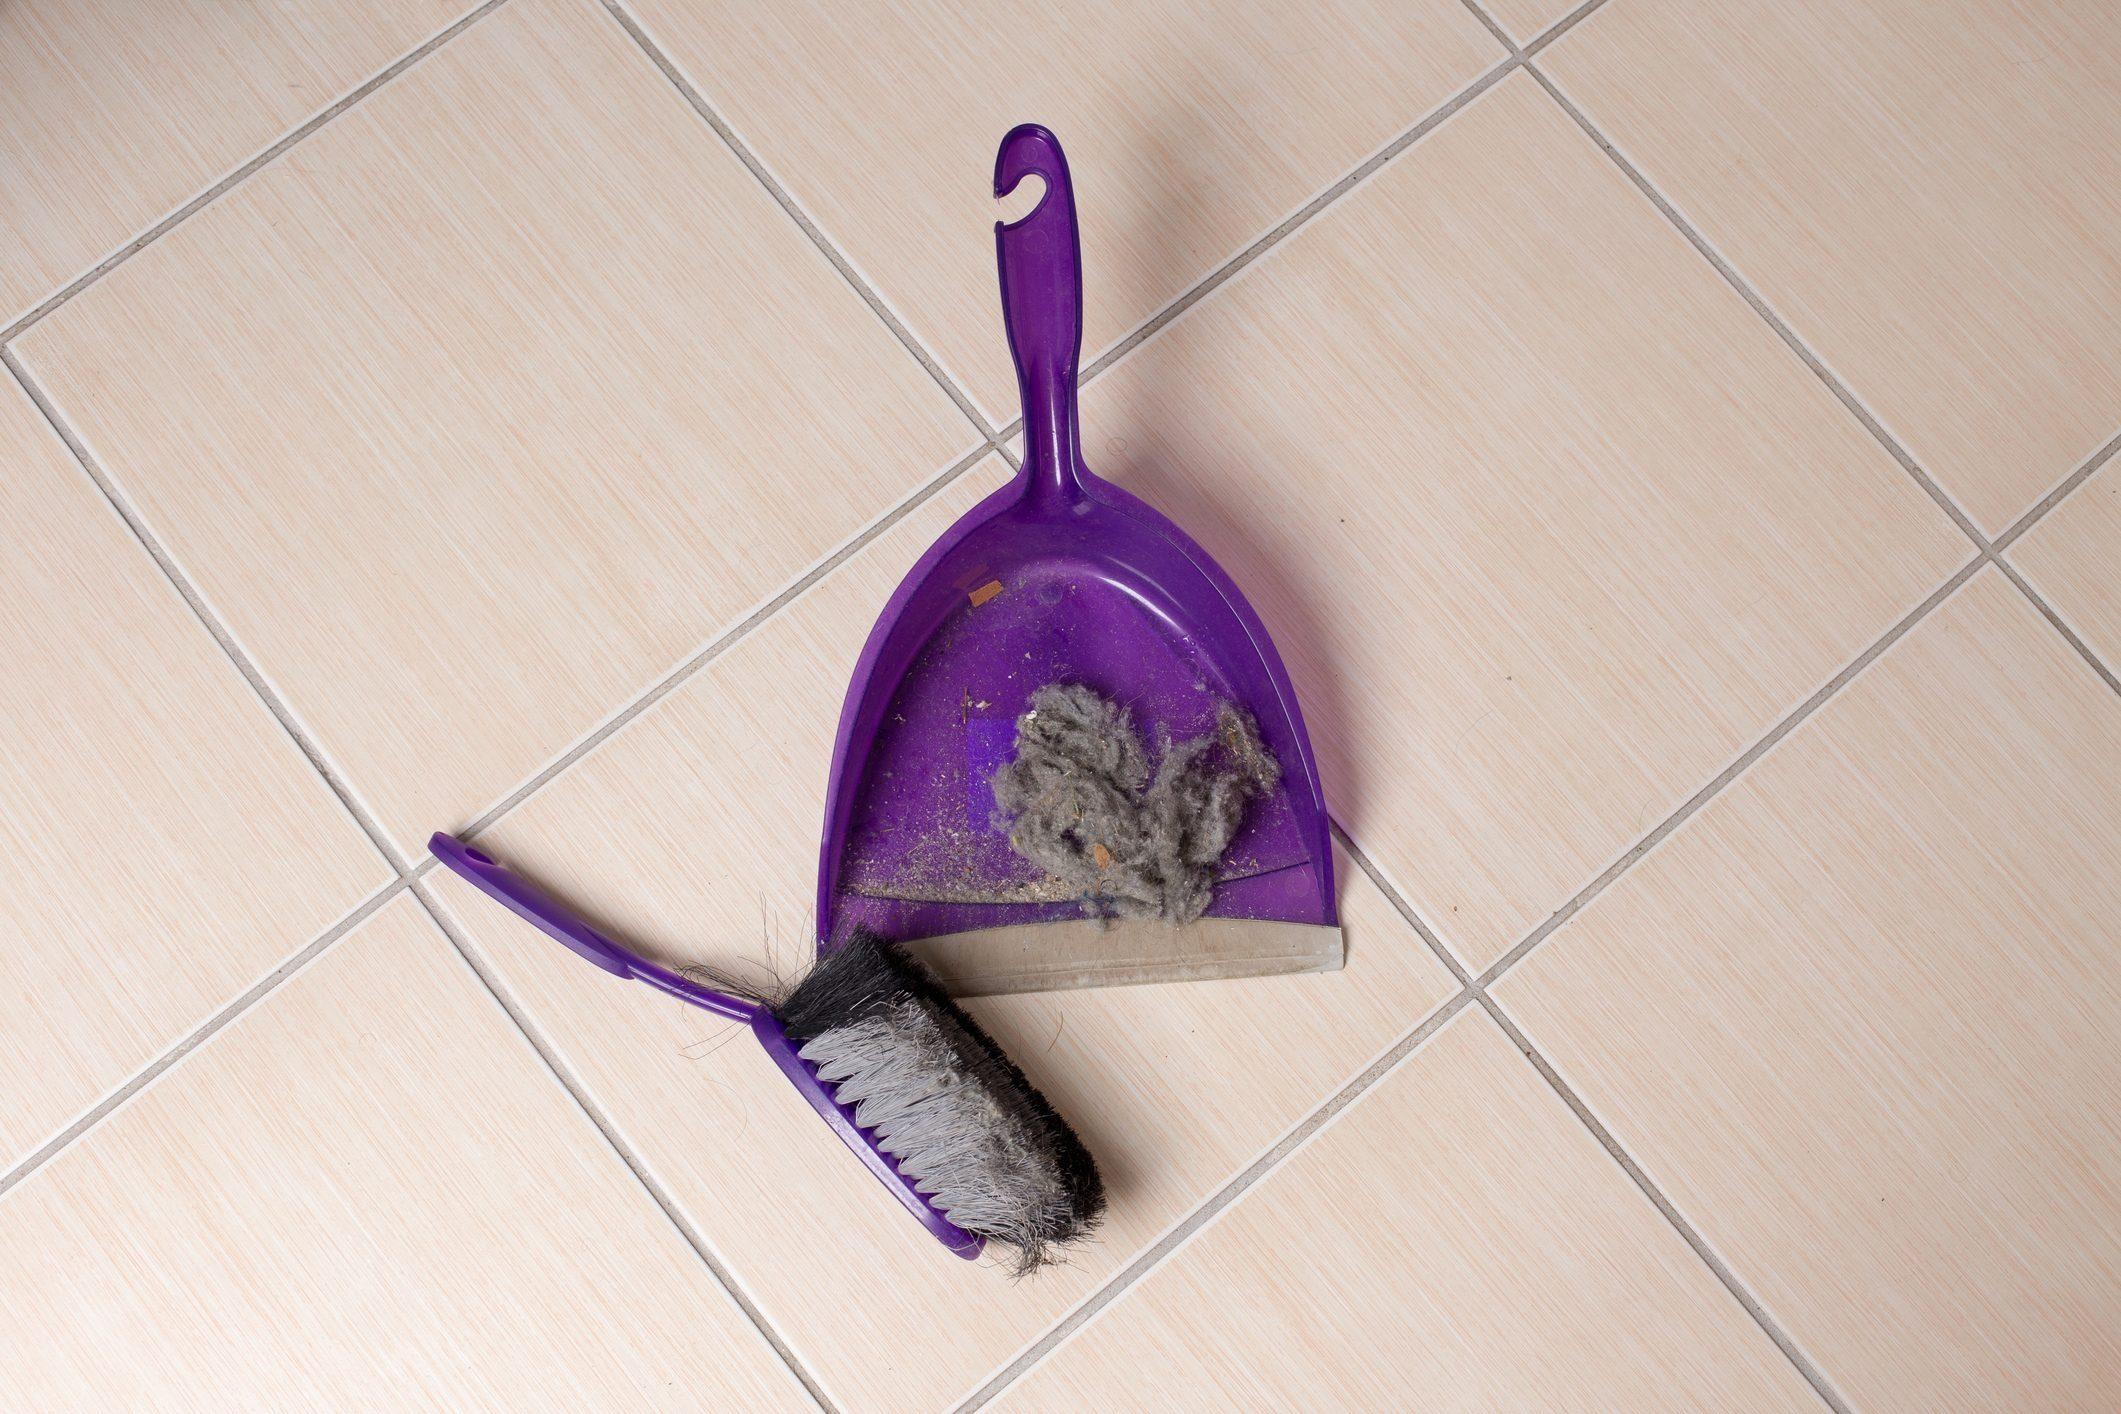 Dust pan and brush on tiled floor